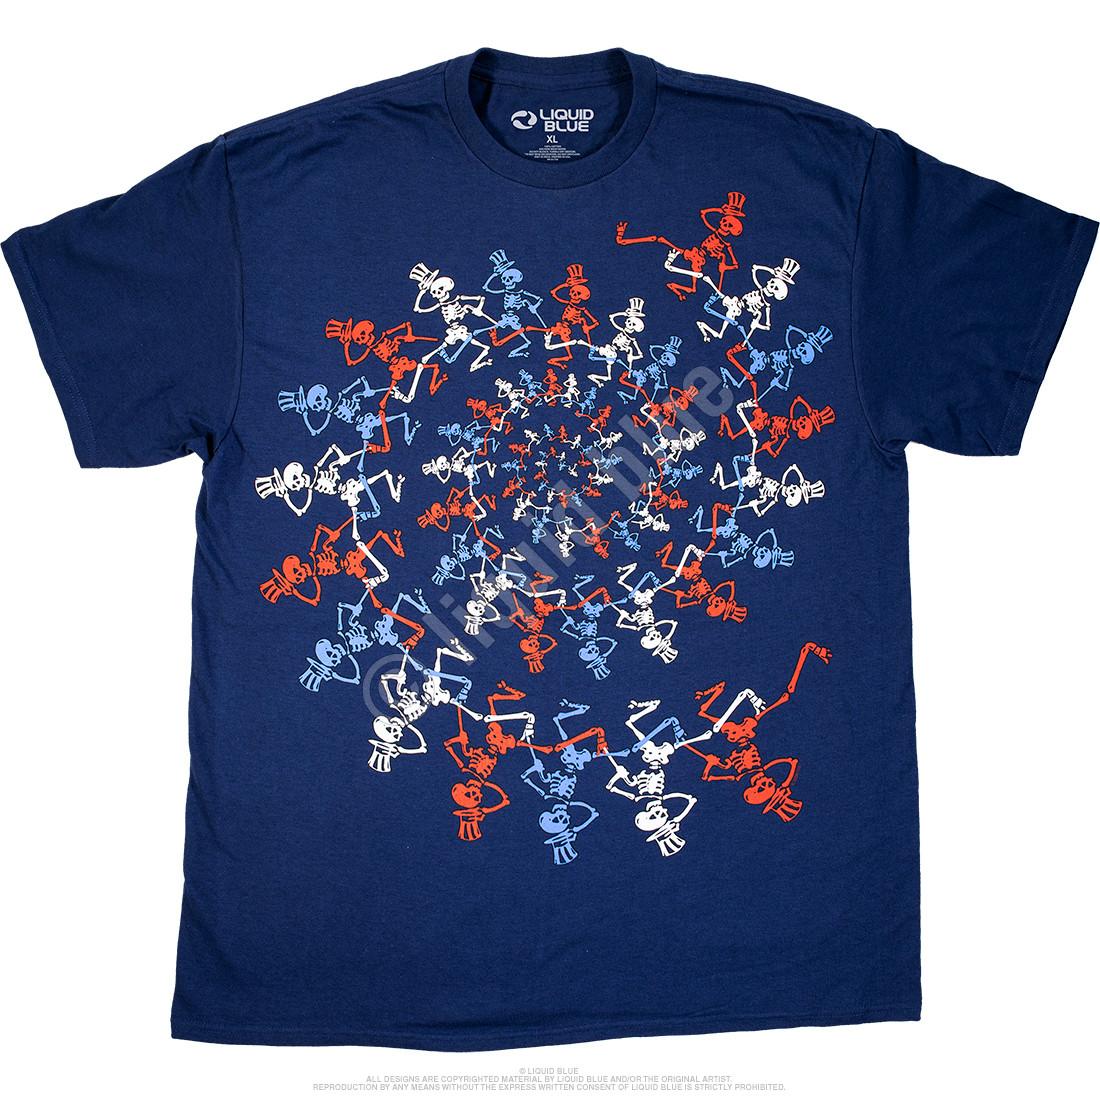 USA Spiral Skeletons Navy T-Shirt